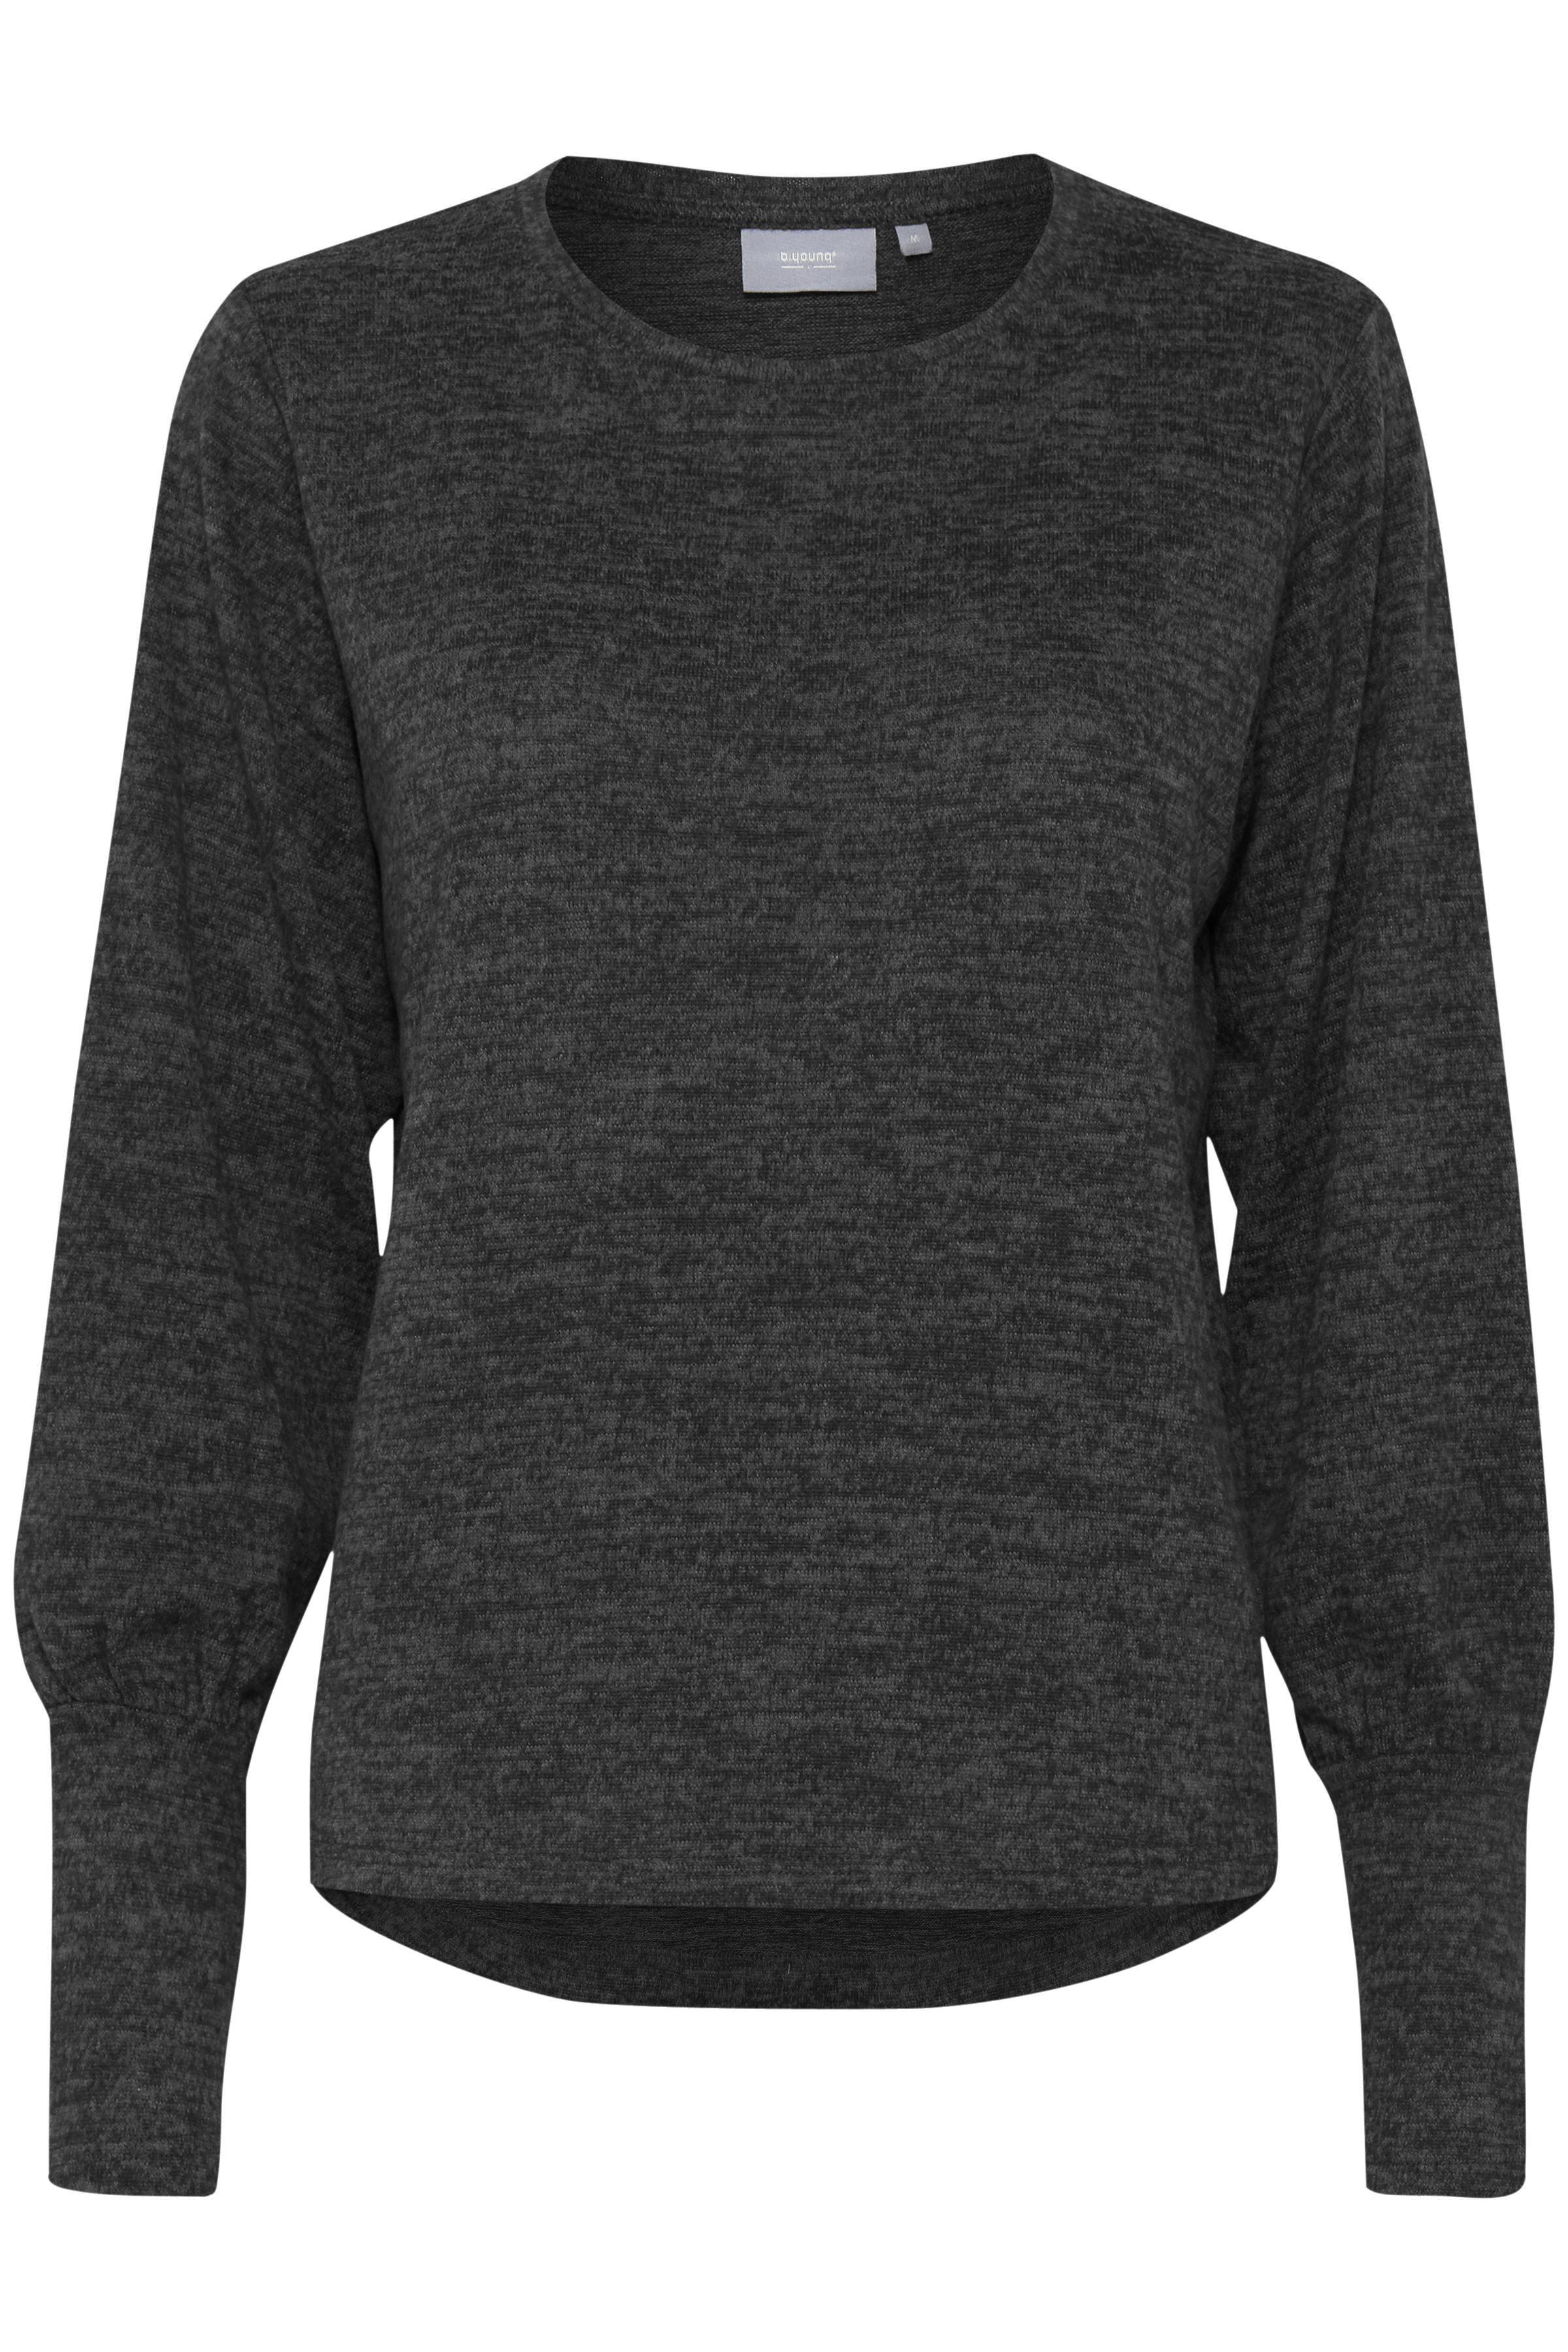 Dark Grey Mel. Langærmet T-shirt fra b.young – Køb Dark Grey Mel. Langærmet T-shirt fra str. XS-XL her